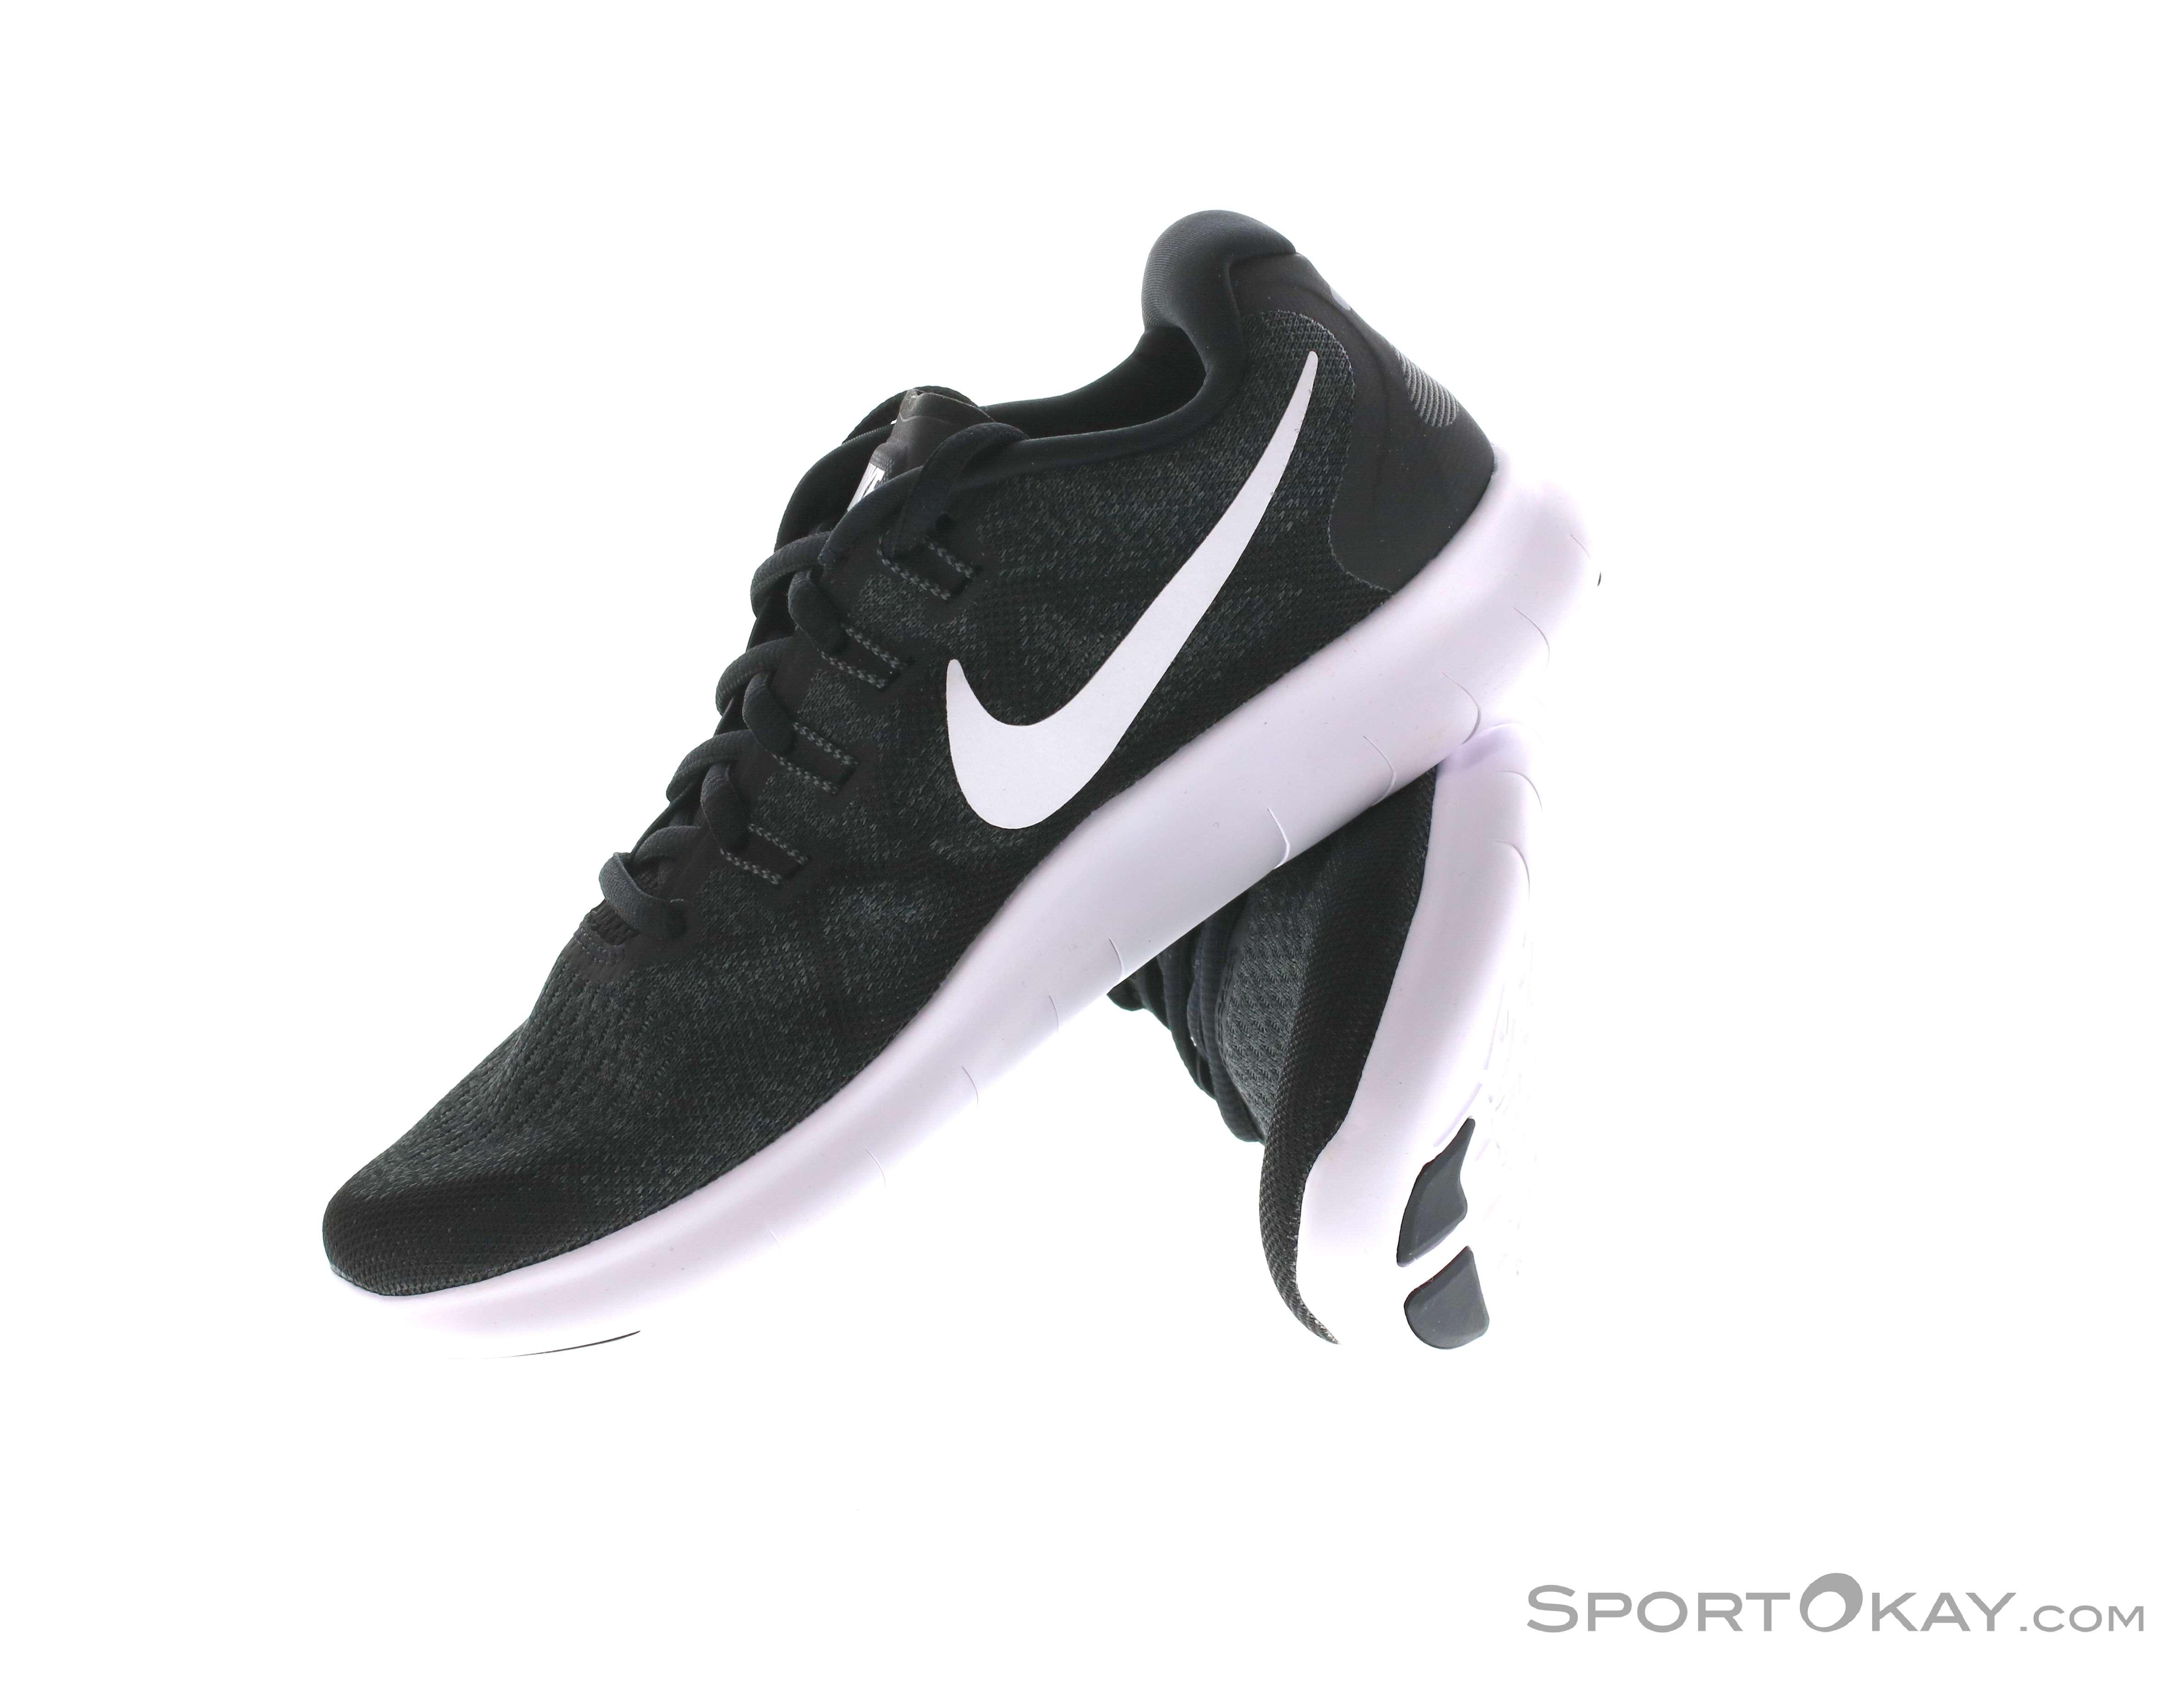 big sale 2c46f 2a170 Nike Free Run 2 Womens Running Shoes - Running Shoes ...